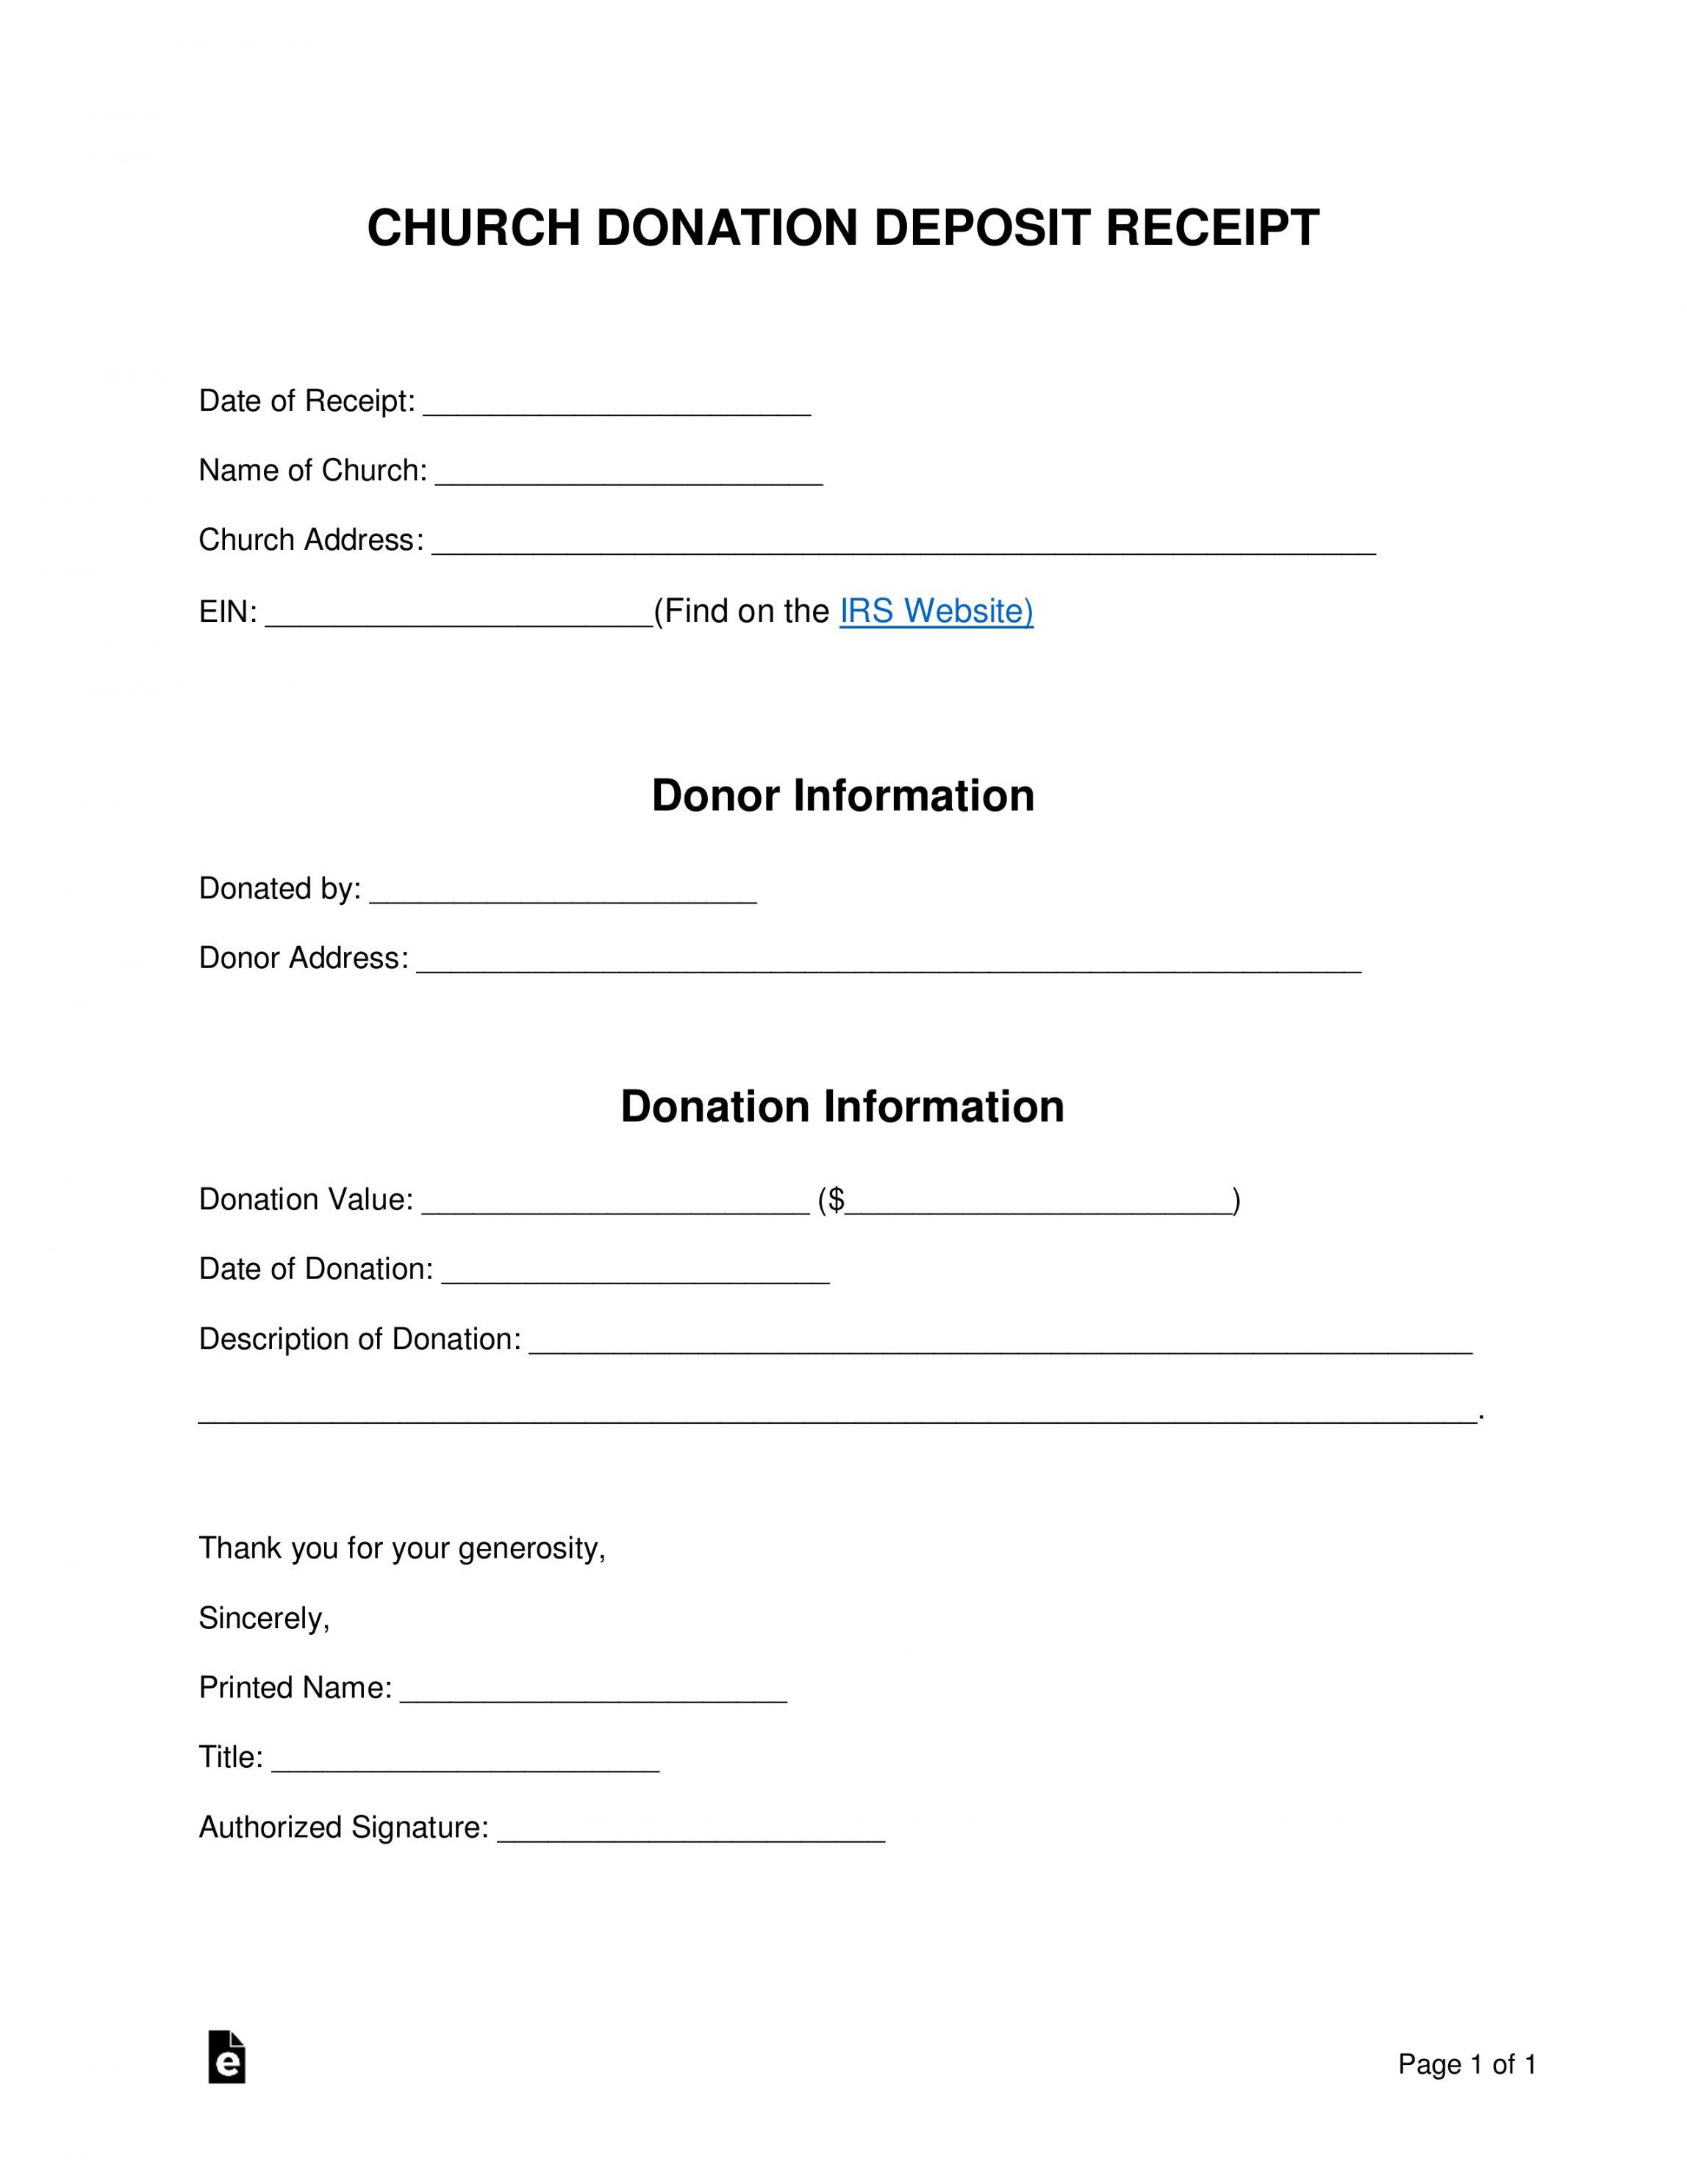 Pin On Receipt Templates Donation receipt template google docs